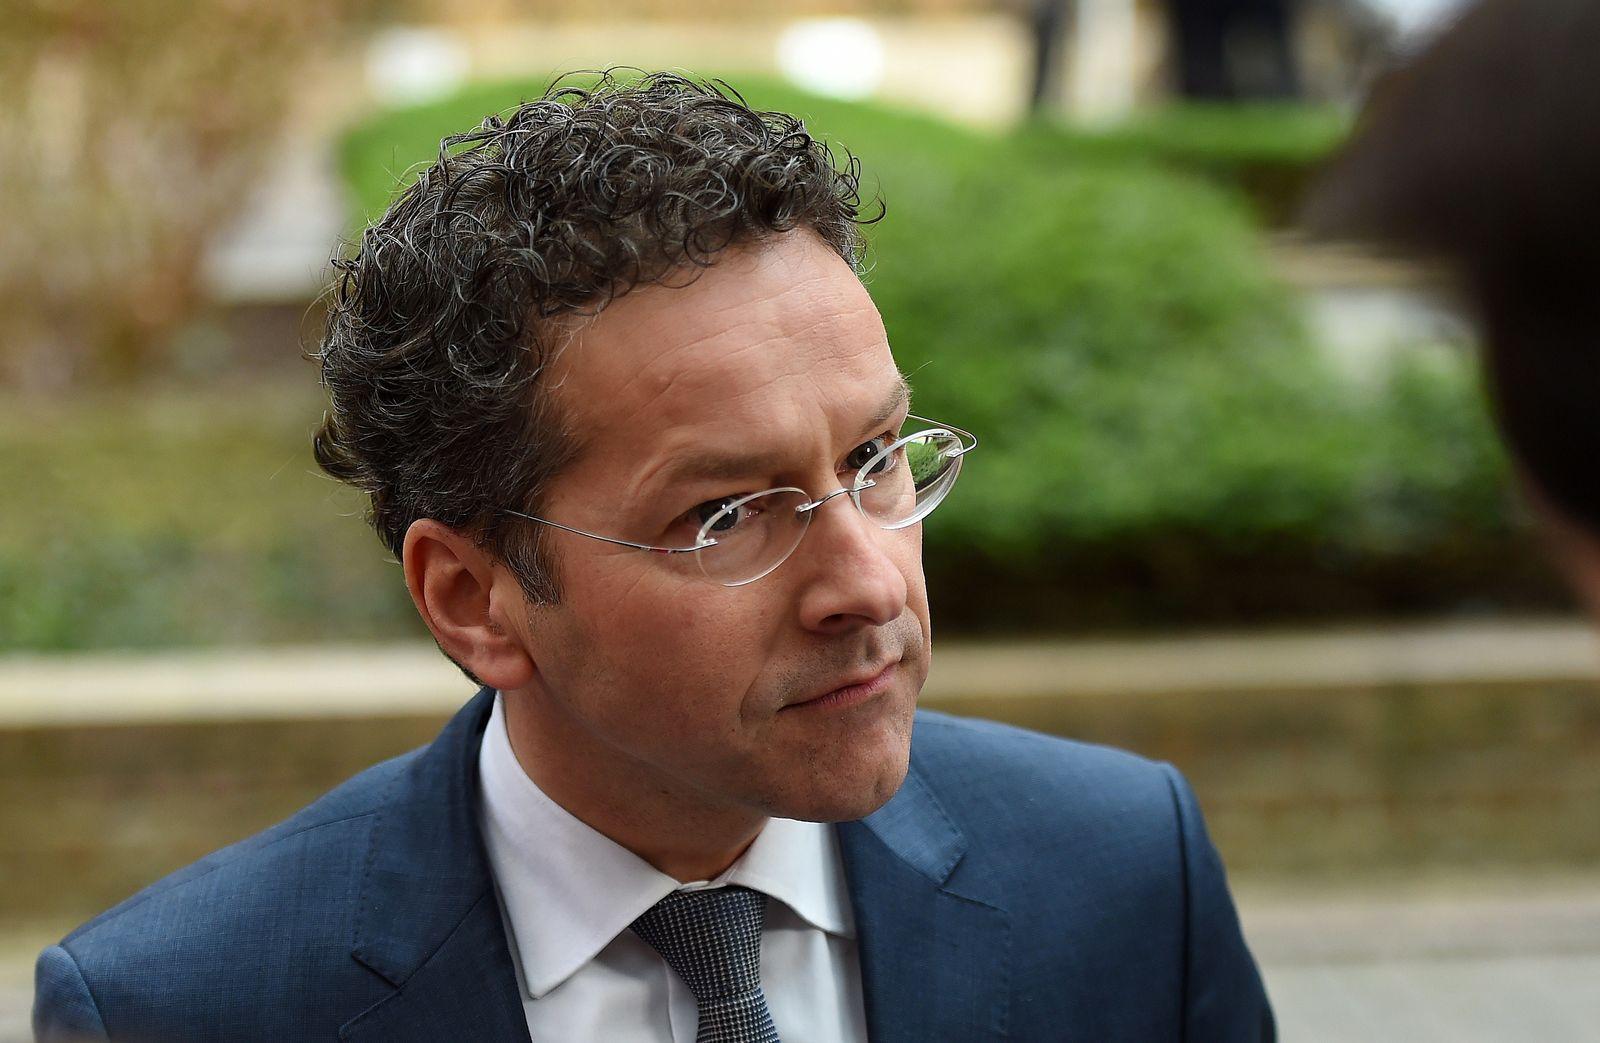 Griechenland/ Verhandlungen/ Jeroen Dijsselbloem